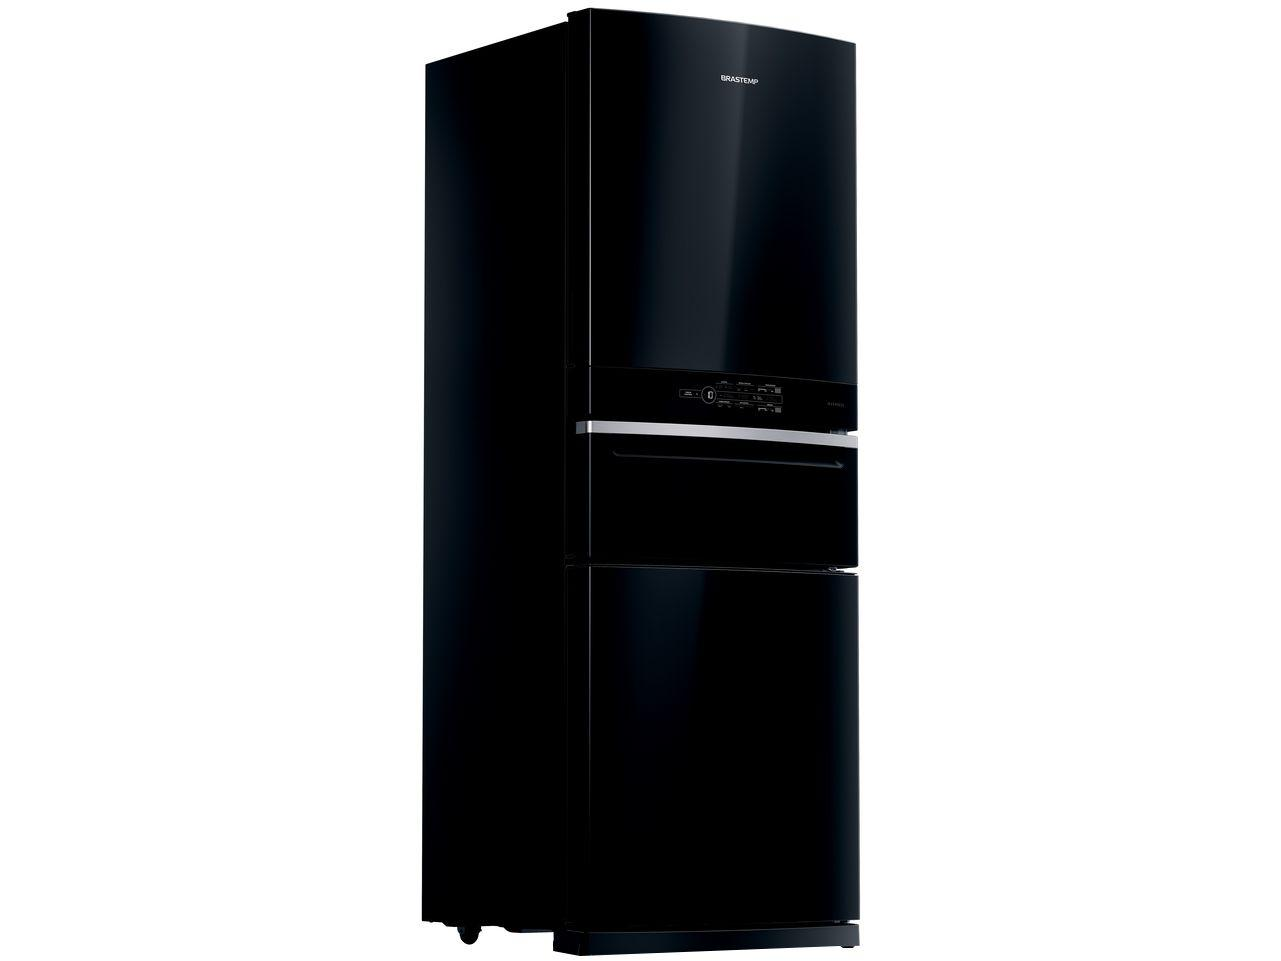 Geladeira/Refrigerador Brastemp Frost Free Inverse - Preta 419L BRY59BE